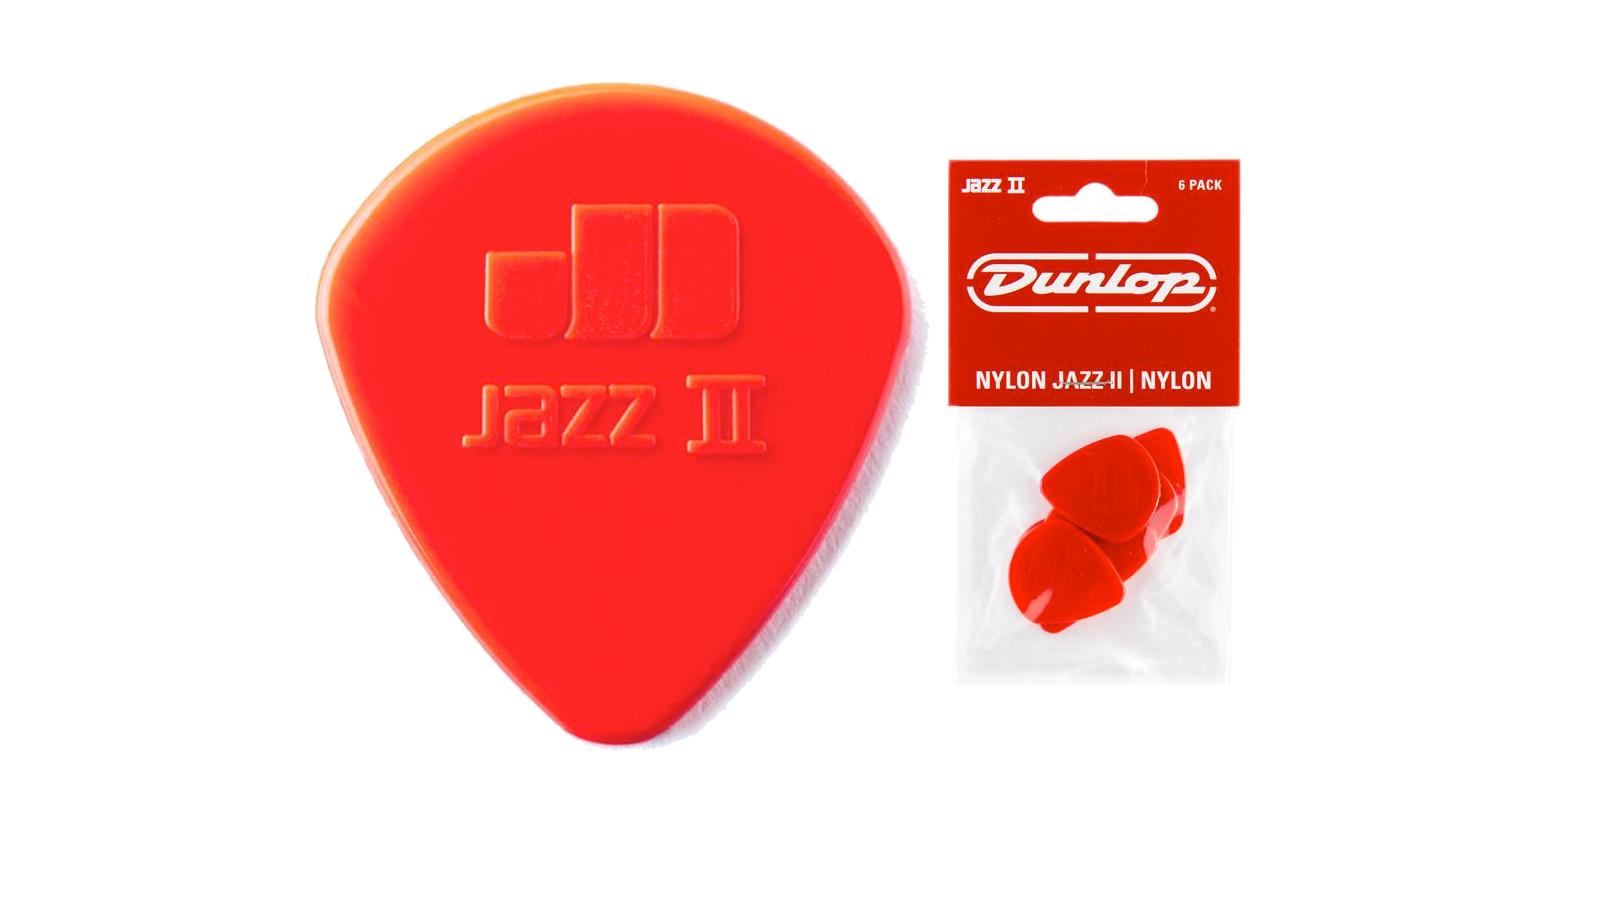 Dunlop Nylon Jazz II Plektrum 1,18 mm 6 Stück rot